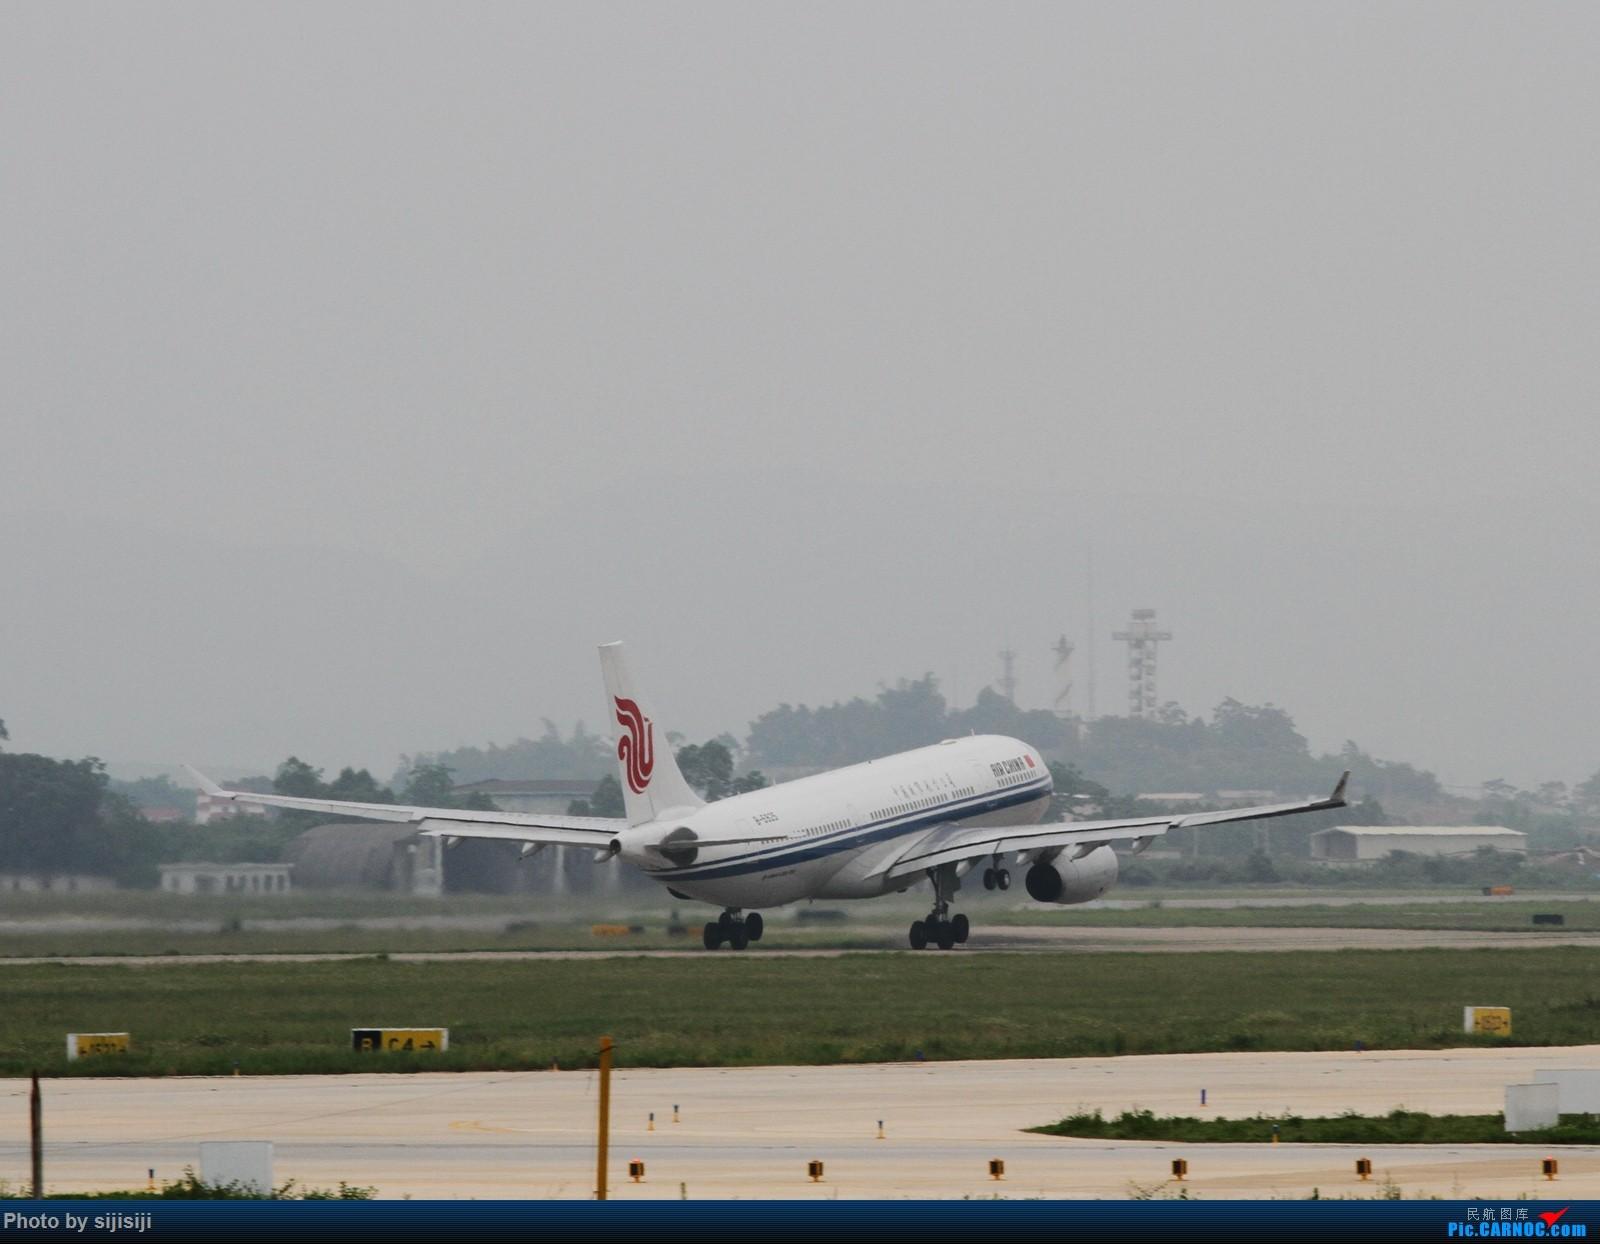 Re:[原创]【NNG飞友】屌丝村口迎来金凤凰,国航332飞抵NNG AIRBUS A330-200 B-5925 中国南宁吴圩国际机场